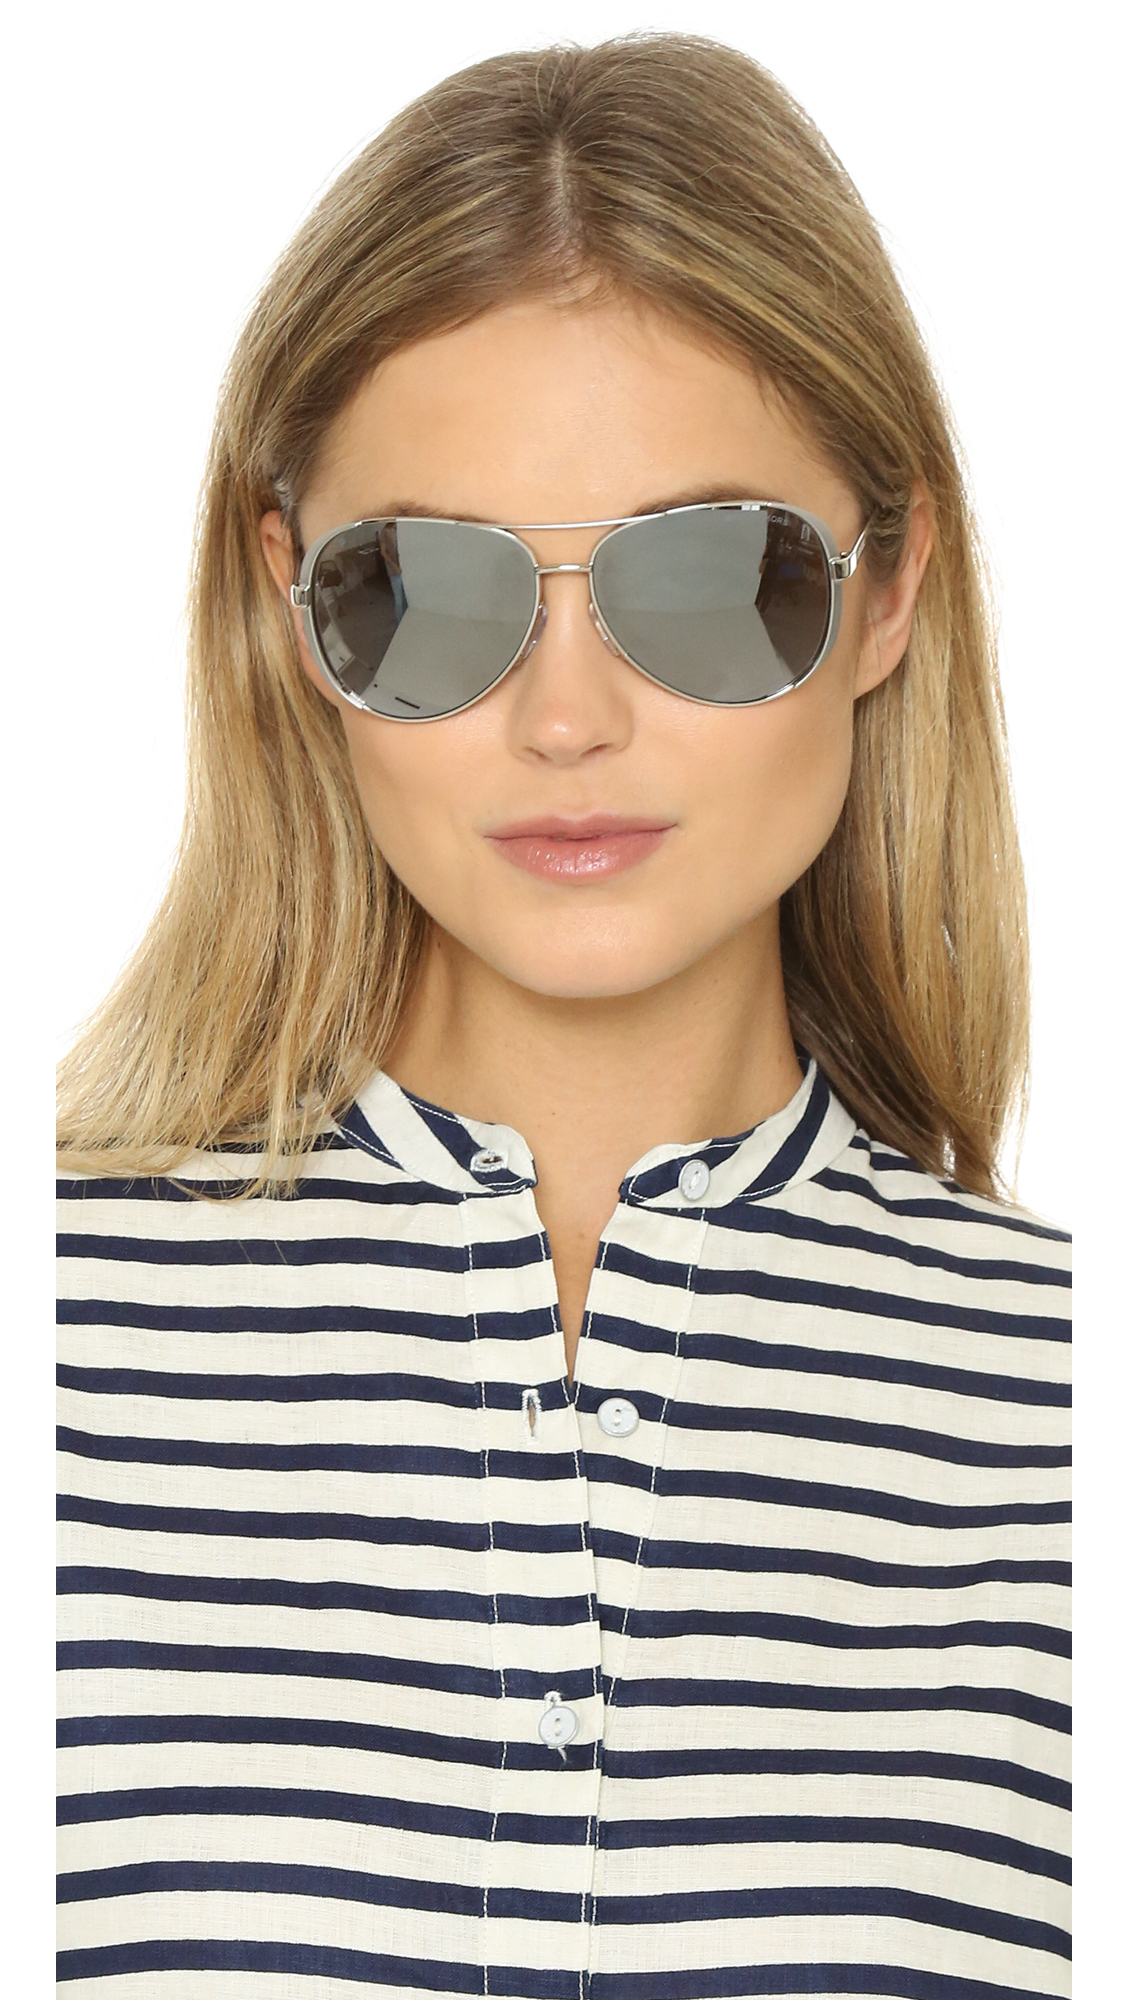 40330095e794 Michael Kors Chelsea Polarized Sunglasses in Metallic - Lyst